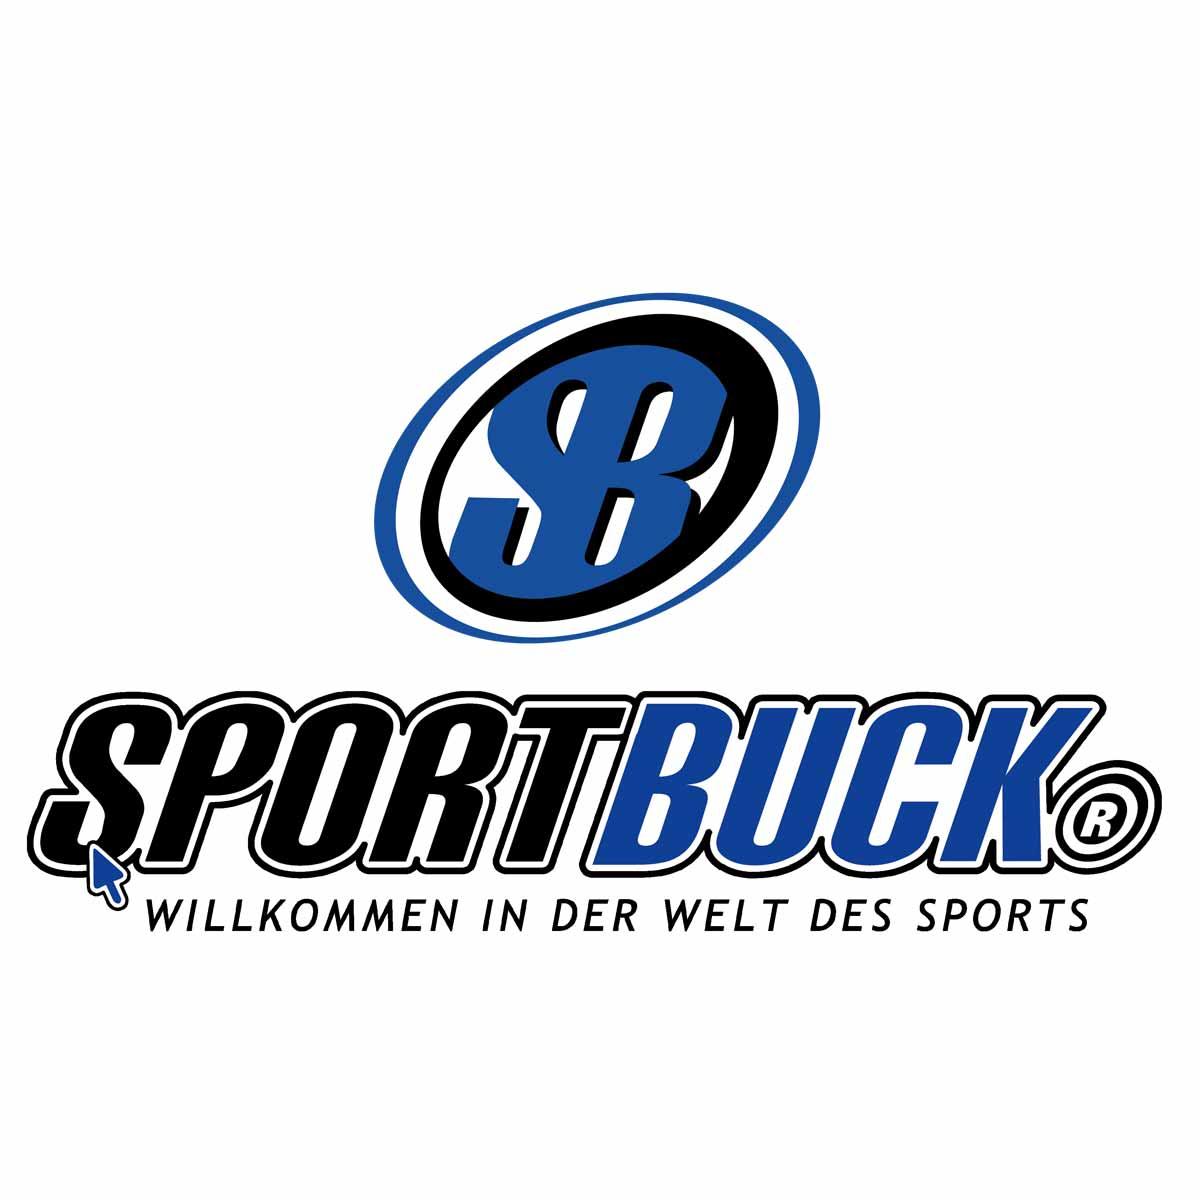 Cable Kit Lite 6.0 Klettersteigset oasis